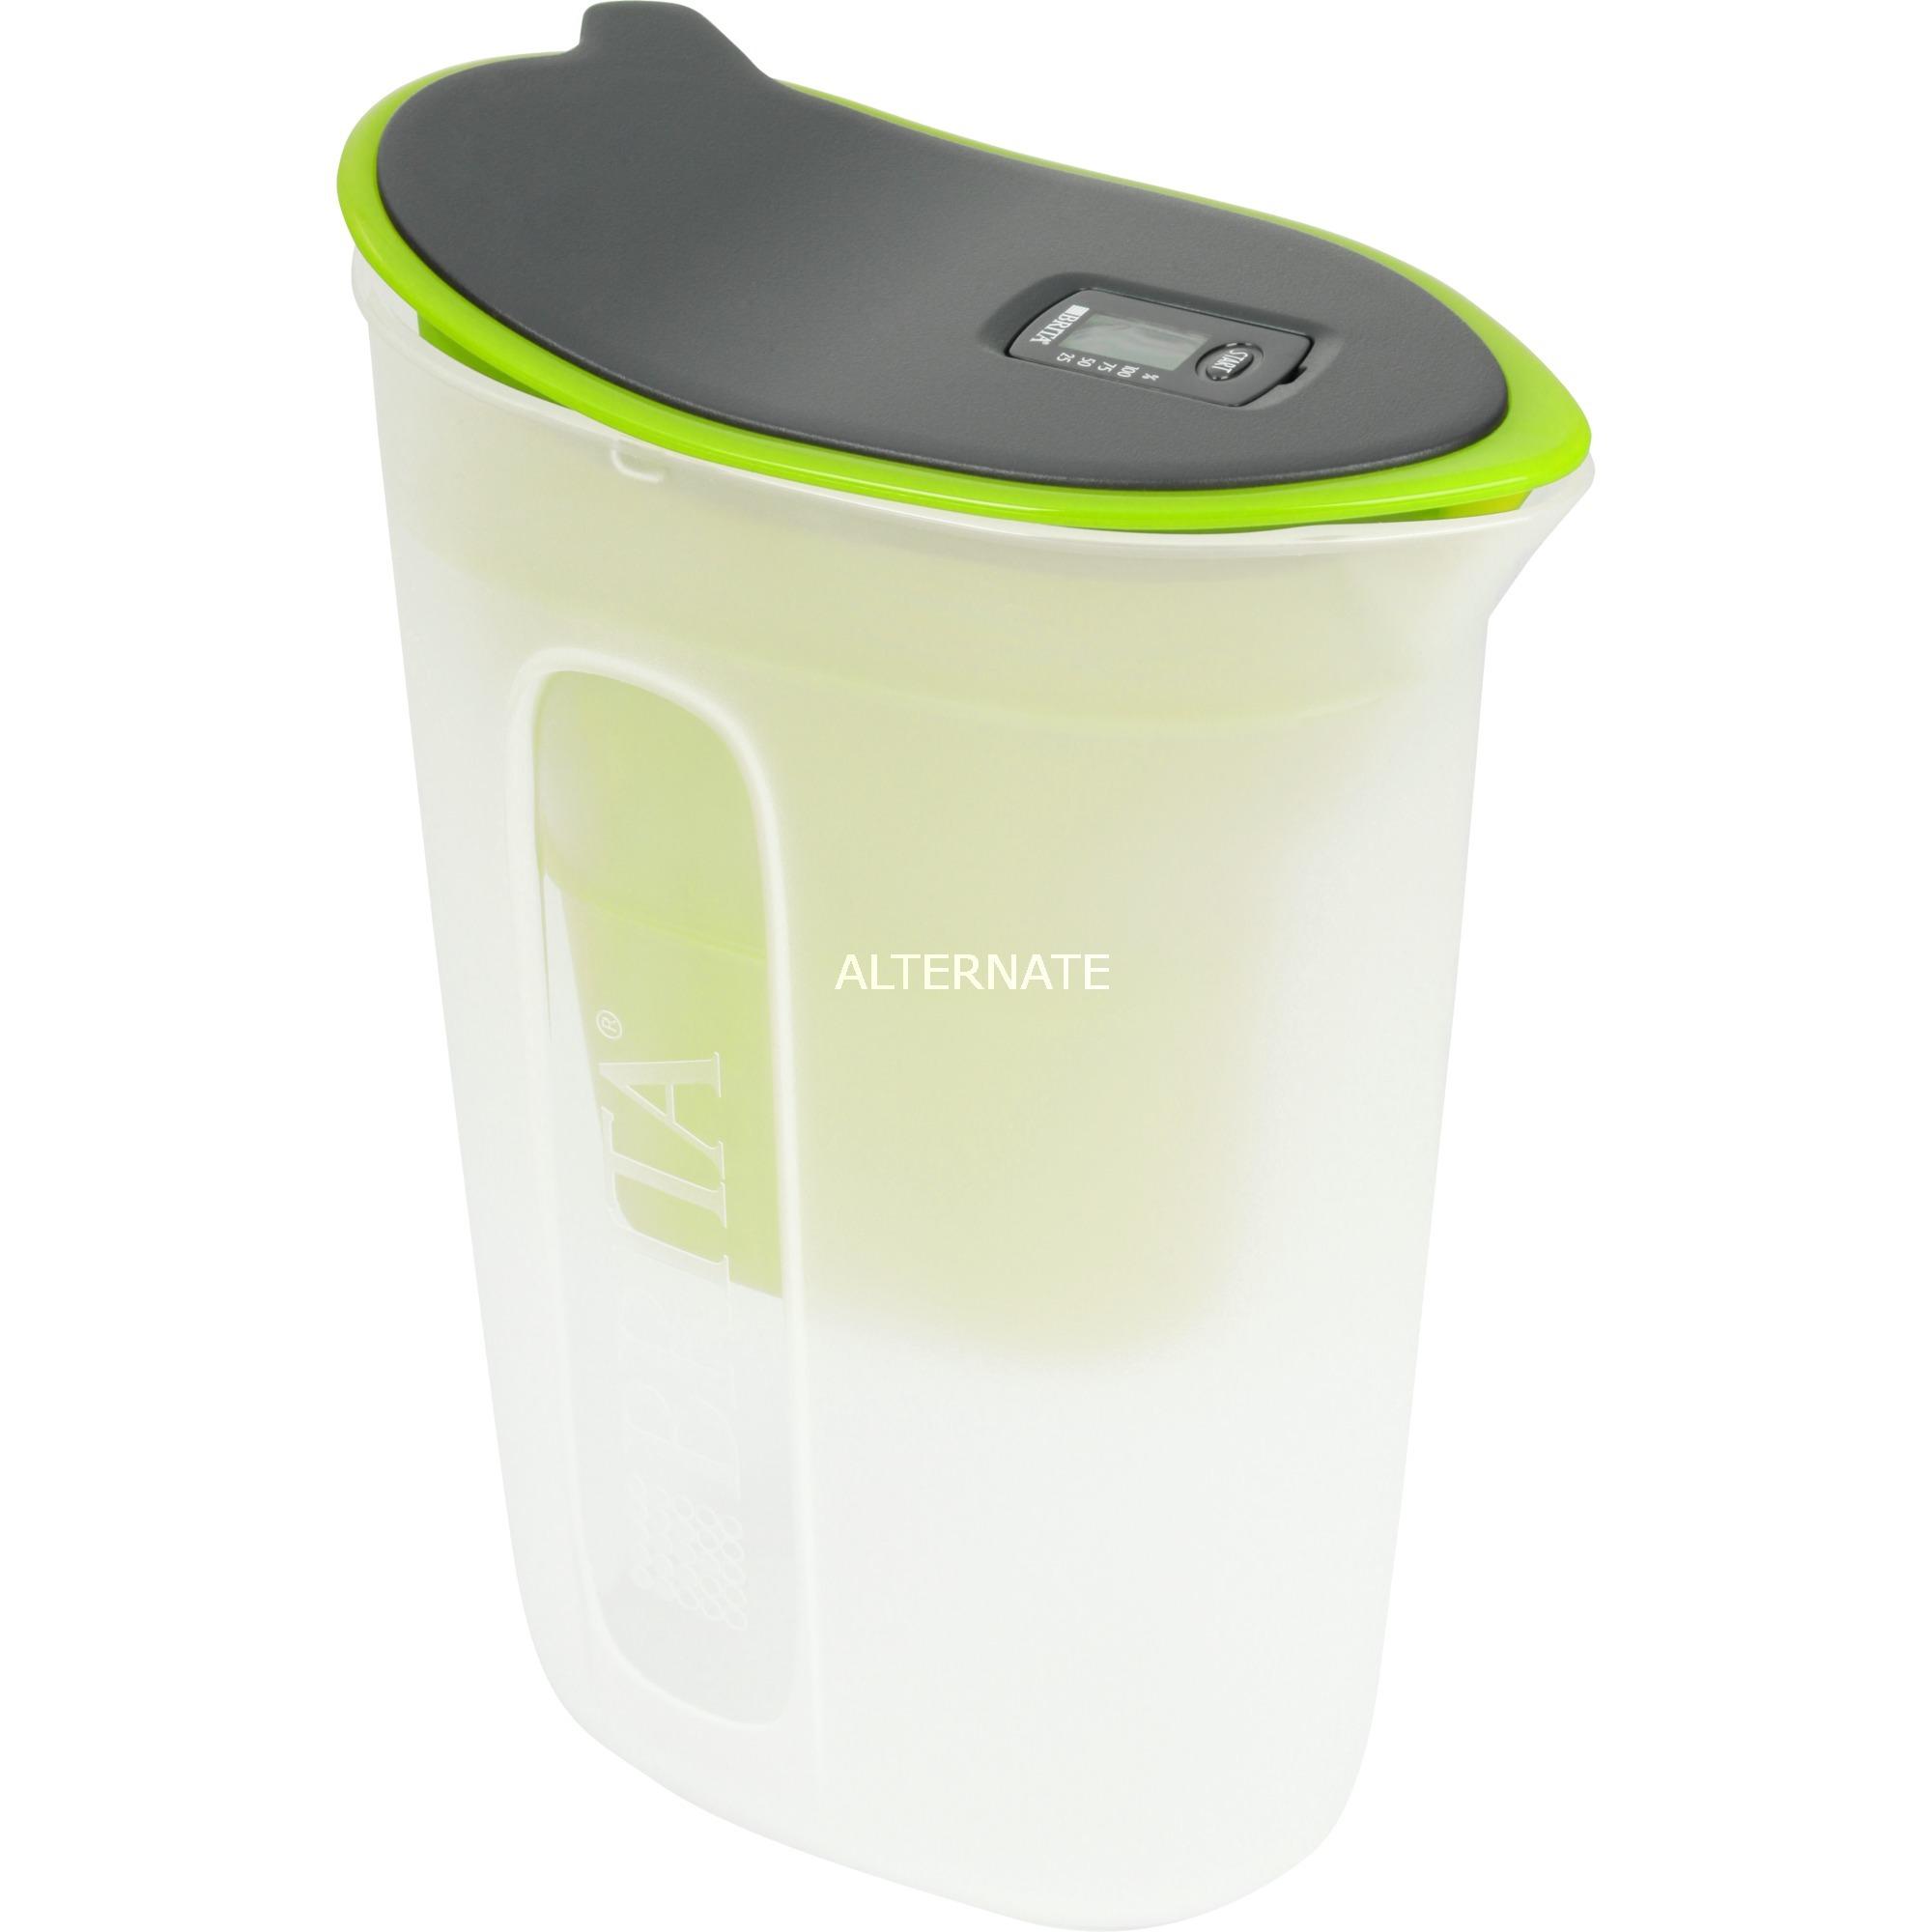 Fun Filtro de agua para jarra Negro, Cal, Transparente 0,5 L